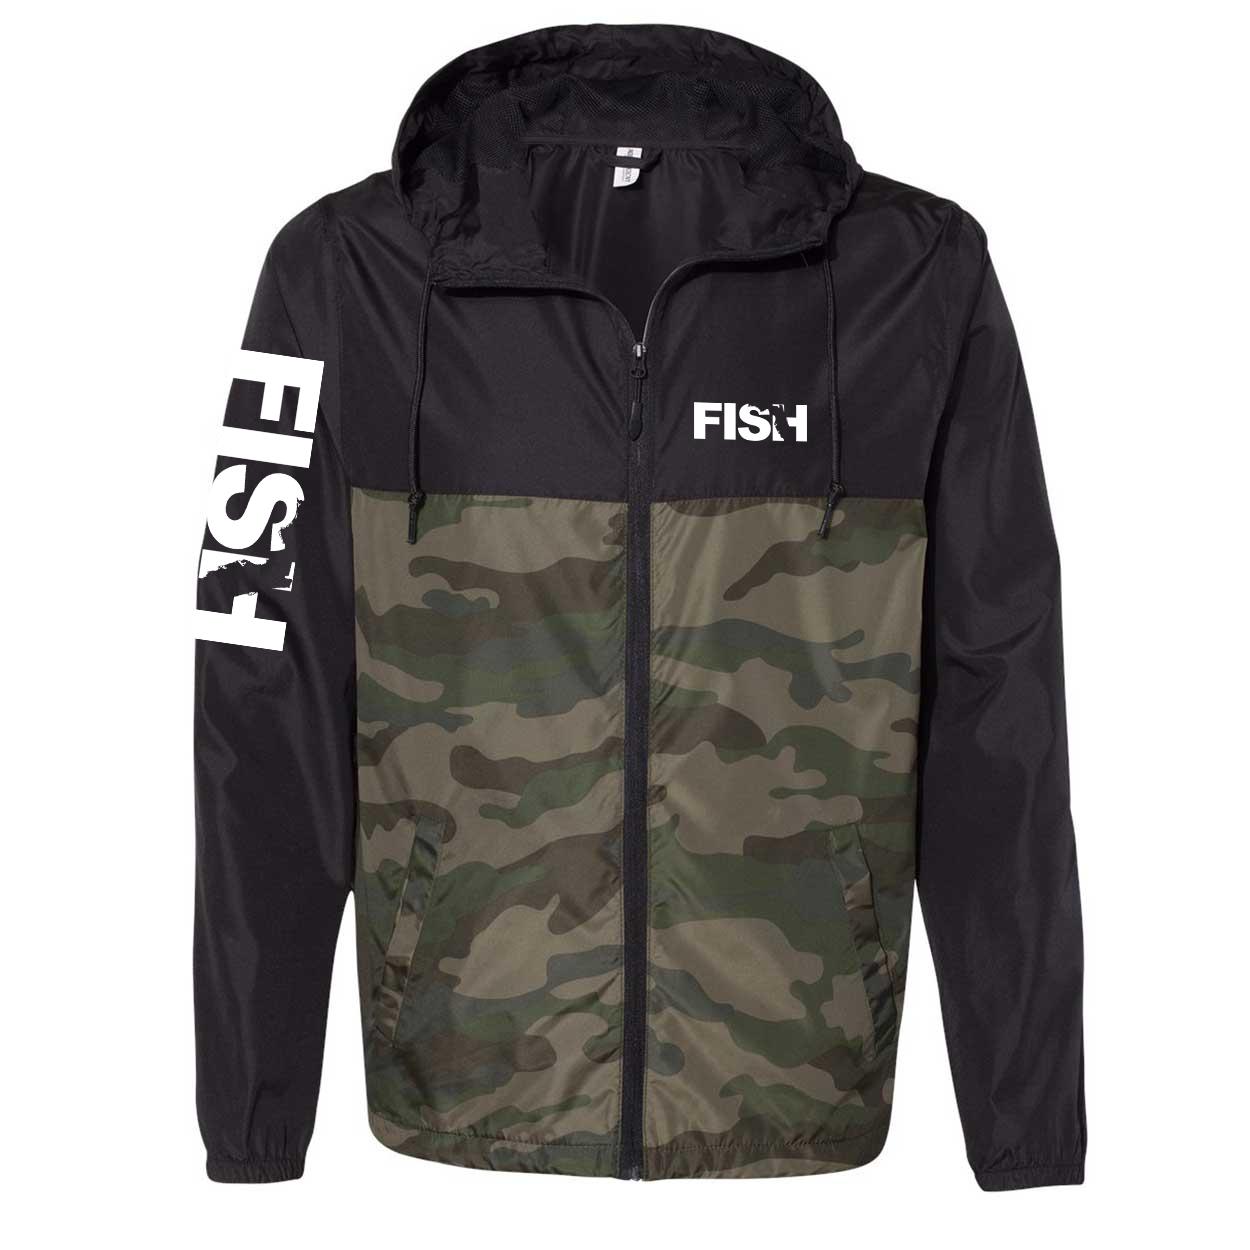 Fish Florida Classic Lightweight Windbreaker Black/Forest Camo (White Logo)